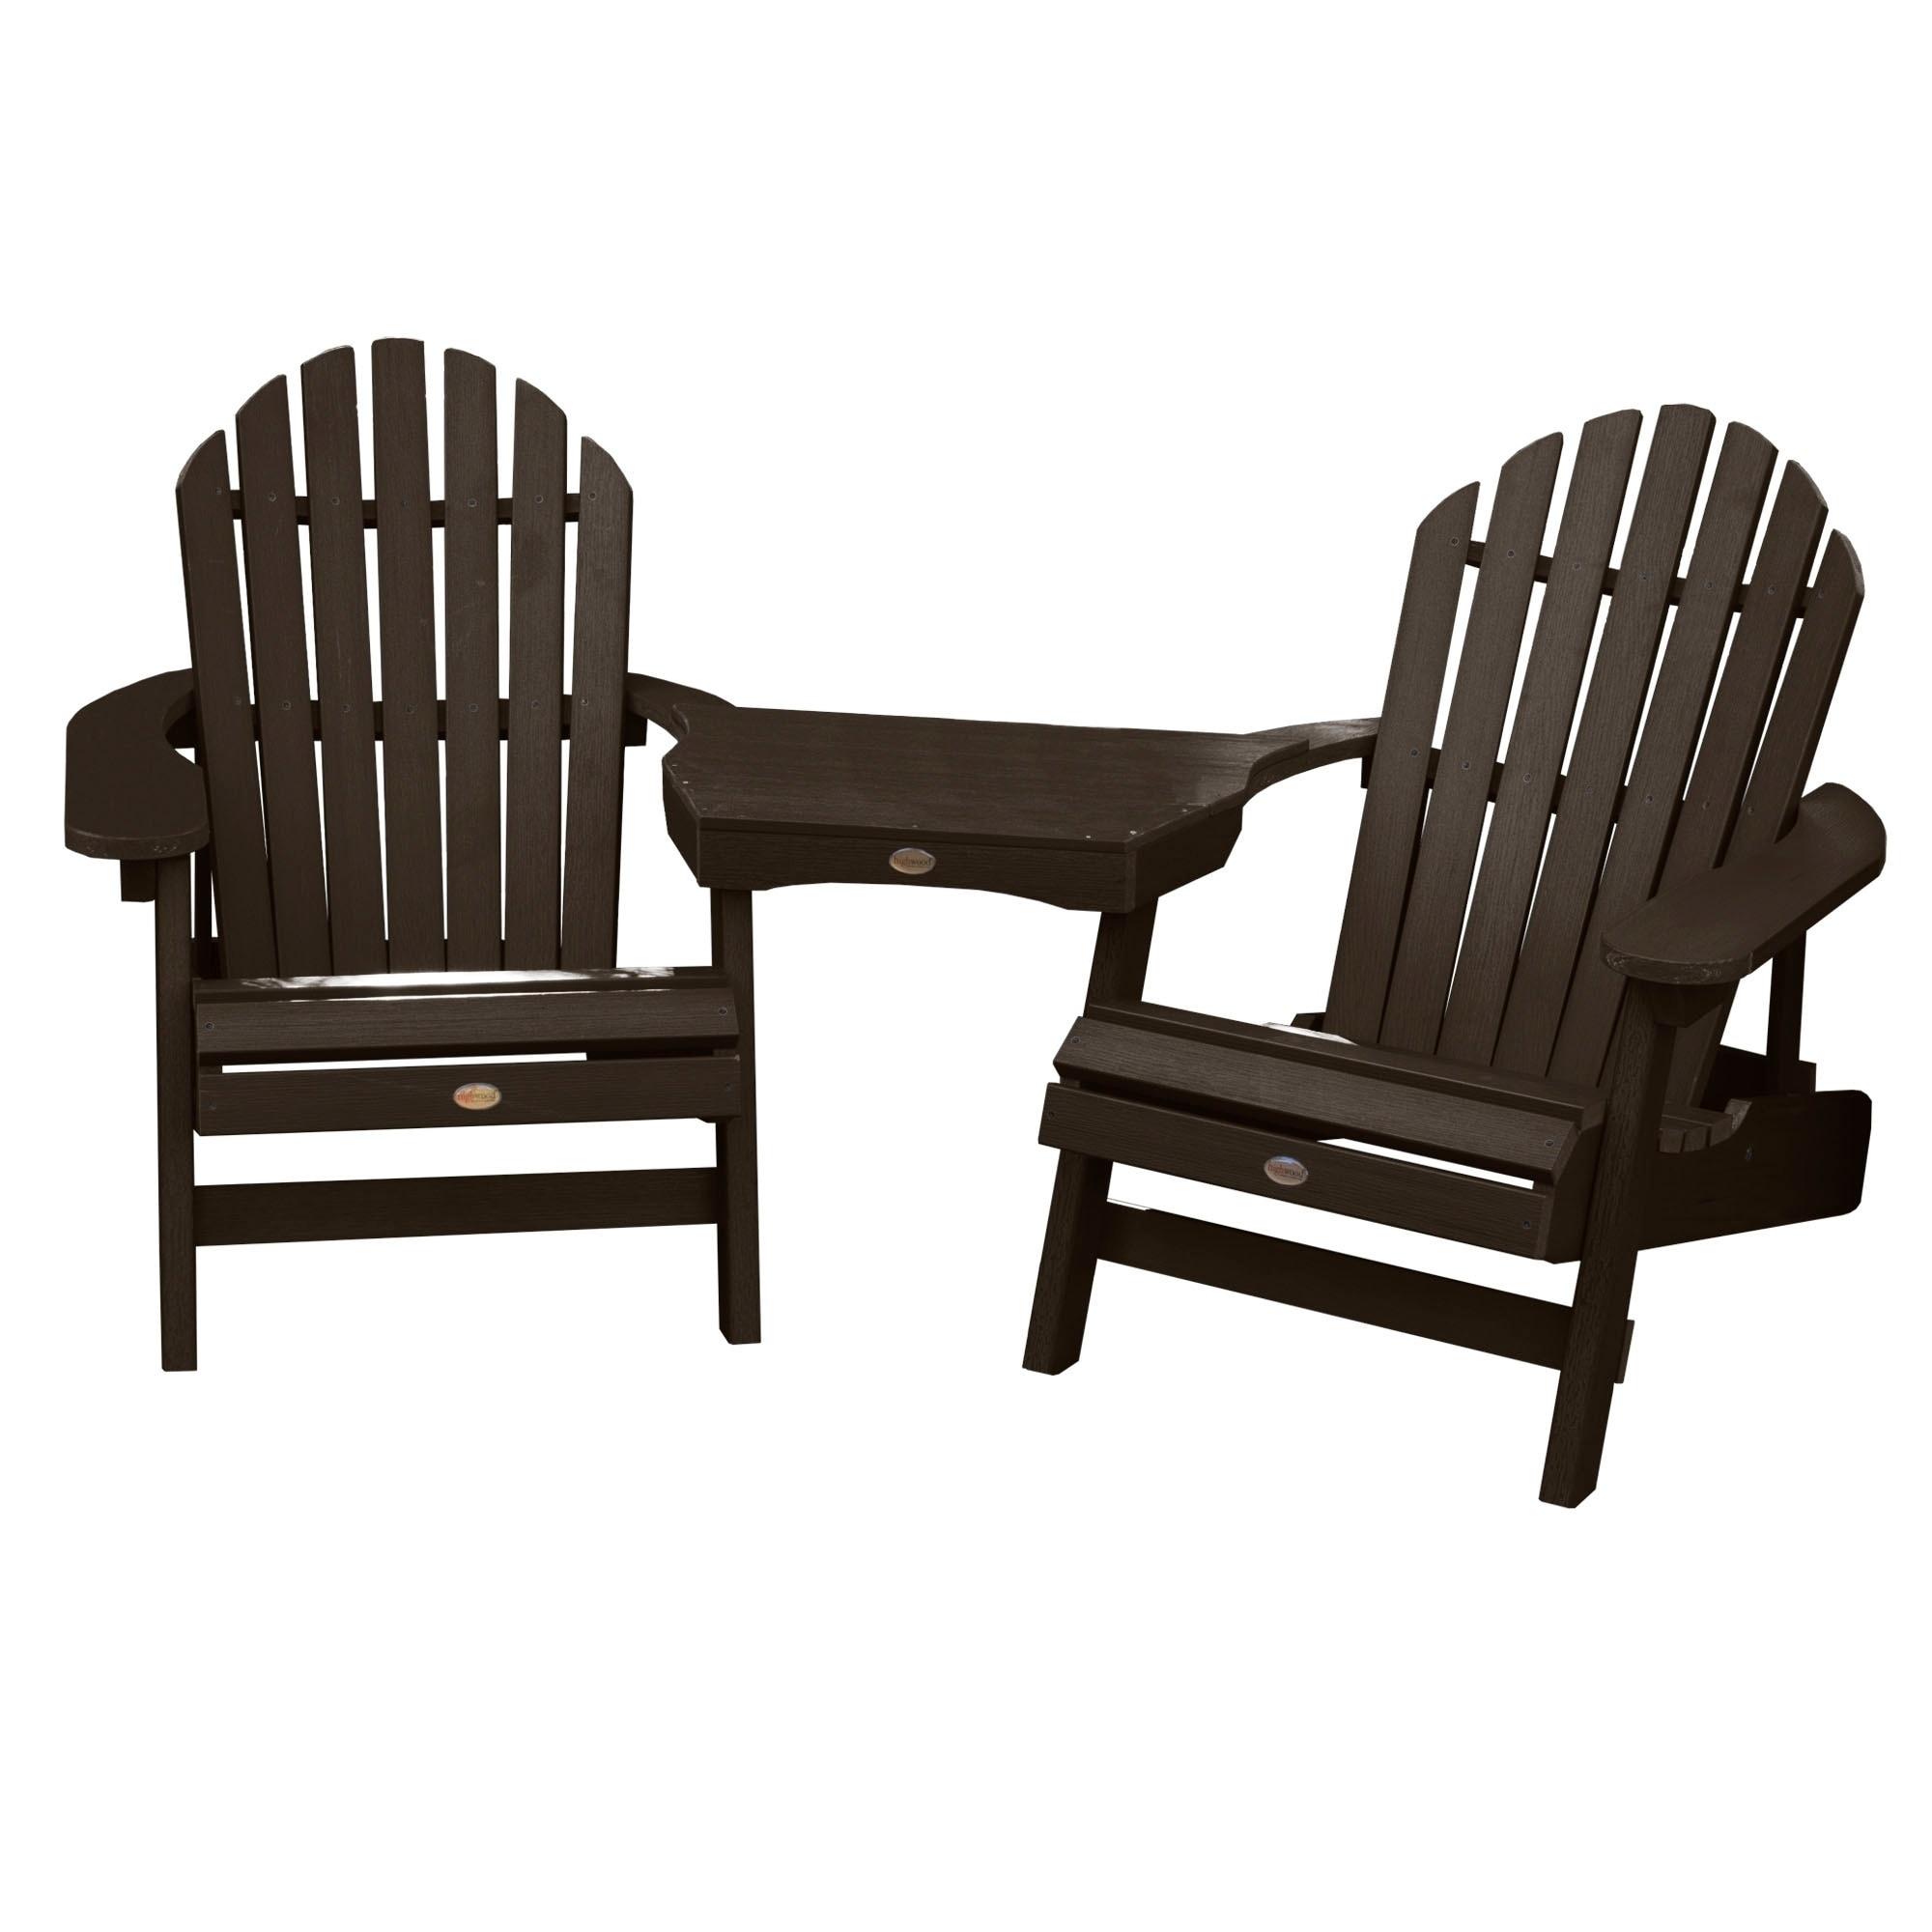 2 Hamilton Folding/Reclining Adirondack Chairs, 1 Tete A Tete Table